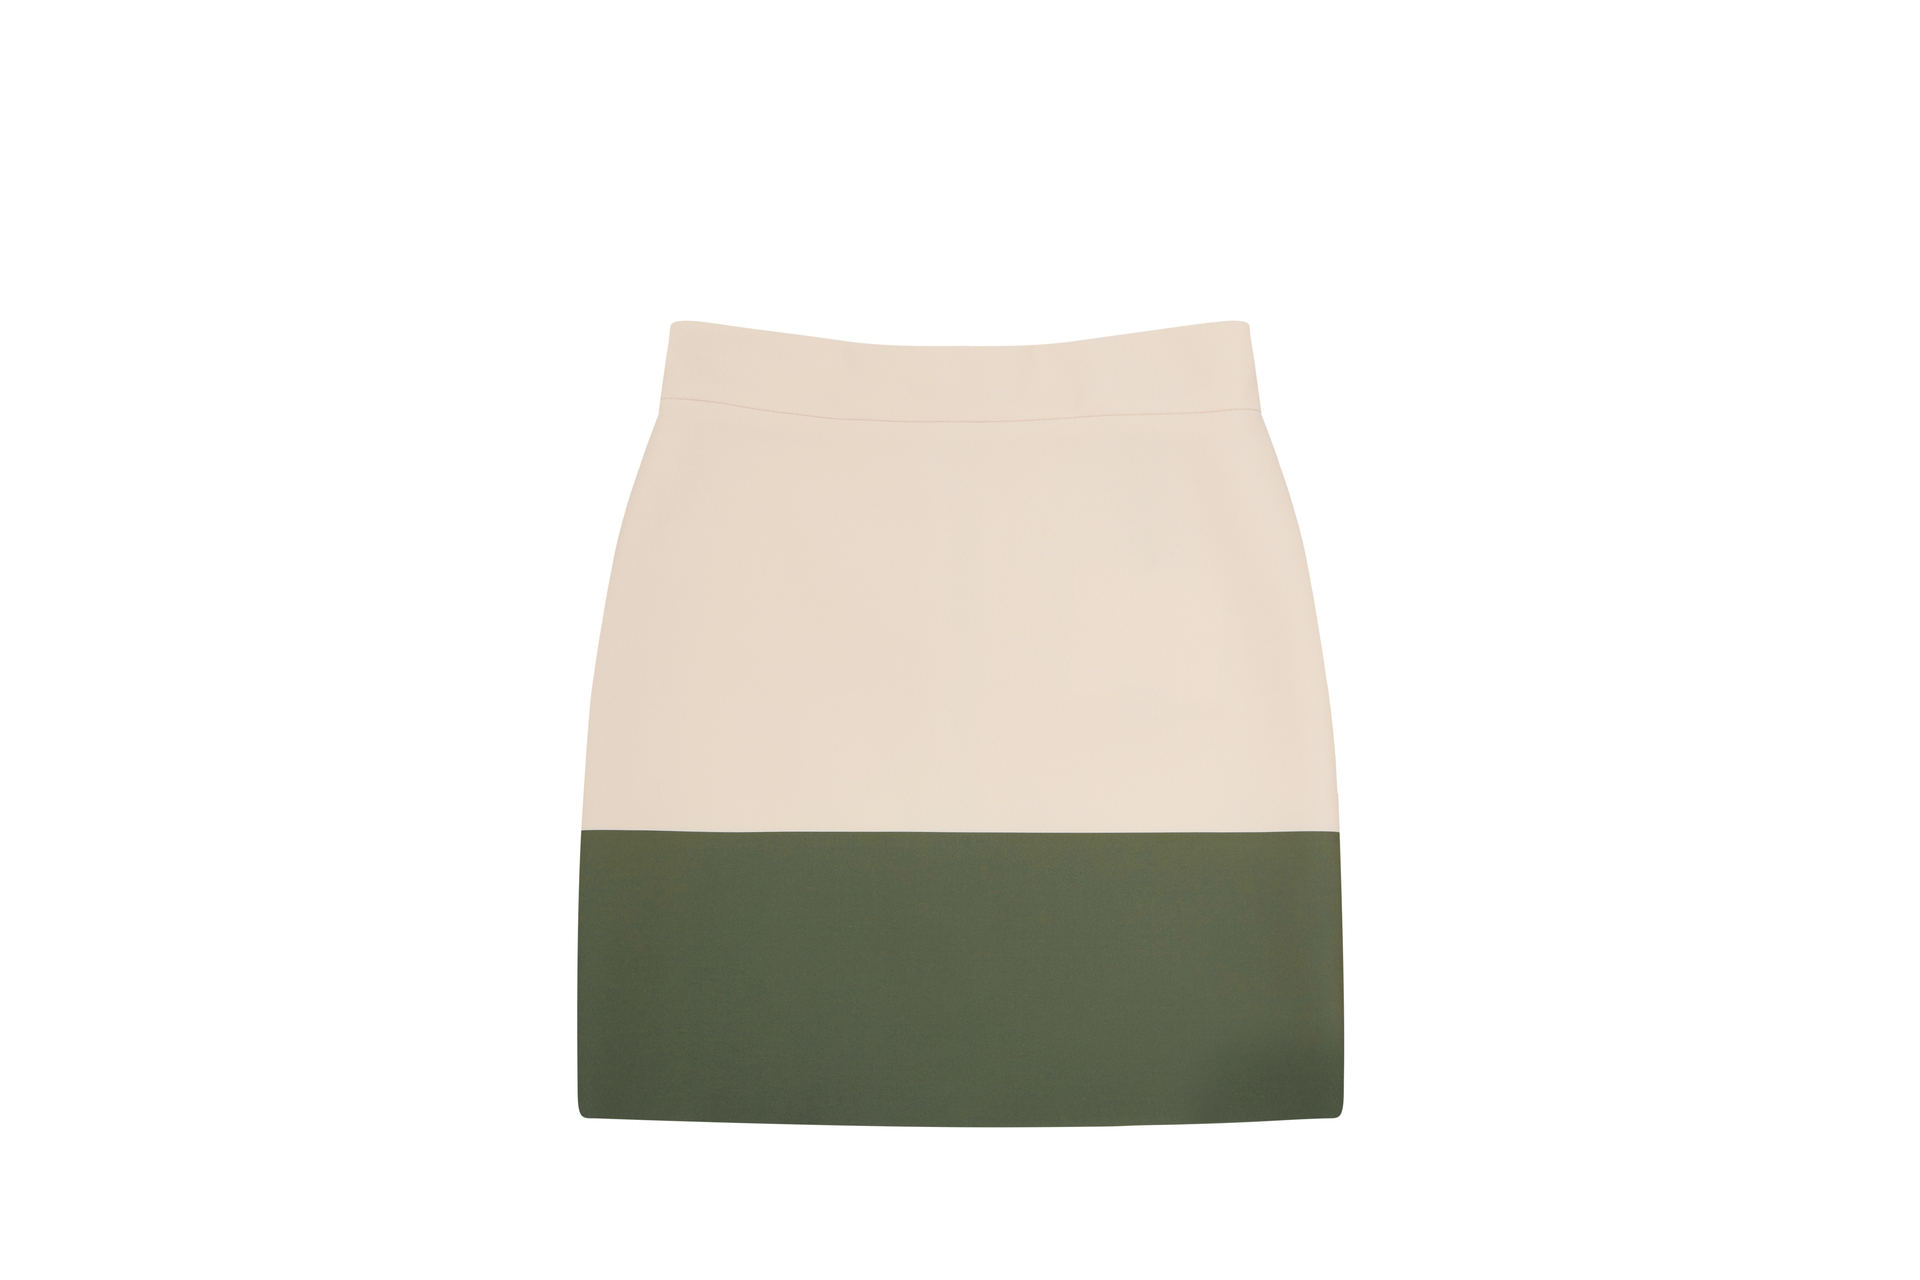 72dpi-2391969f00-30.-BY-JOHNNY,-Bold-Colour-Mini-Skirt-Peach-Green,-250,-www.byjohnny.com.au